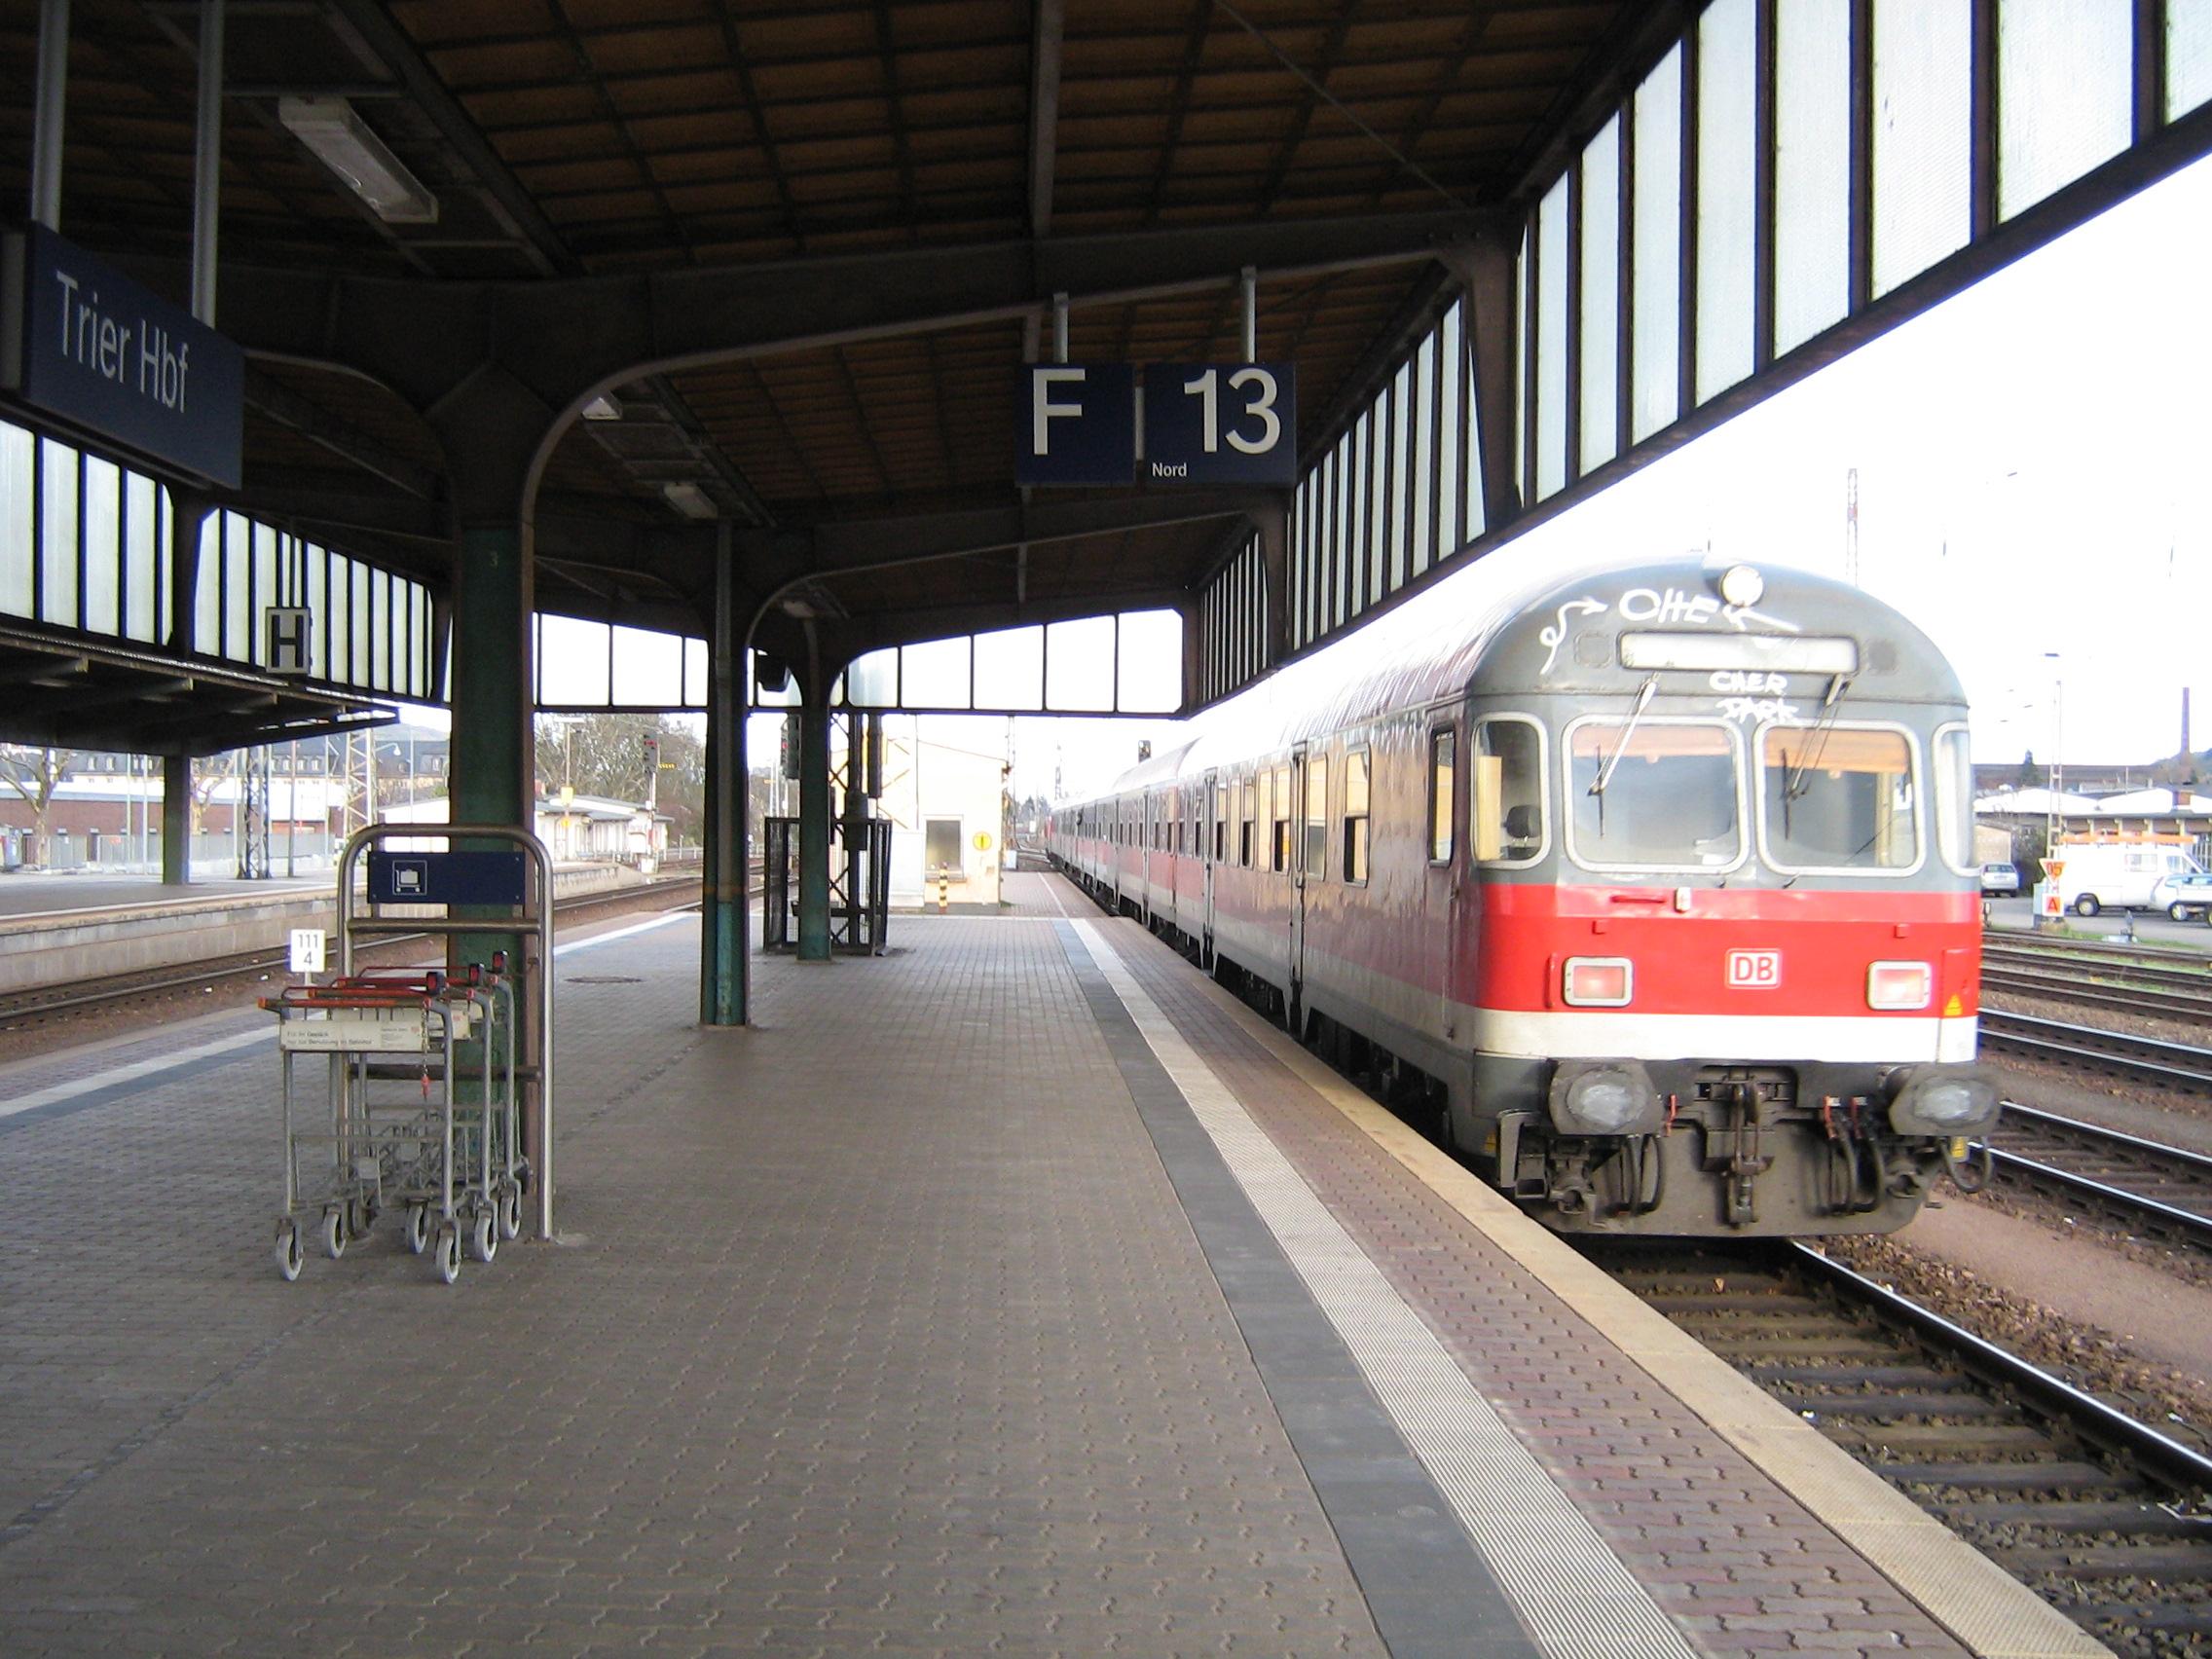 File:Trier station train.jpg - Wikimedia Commons